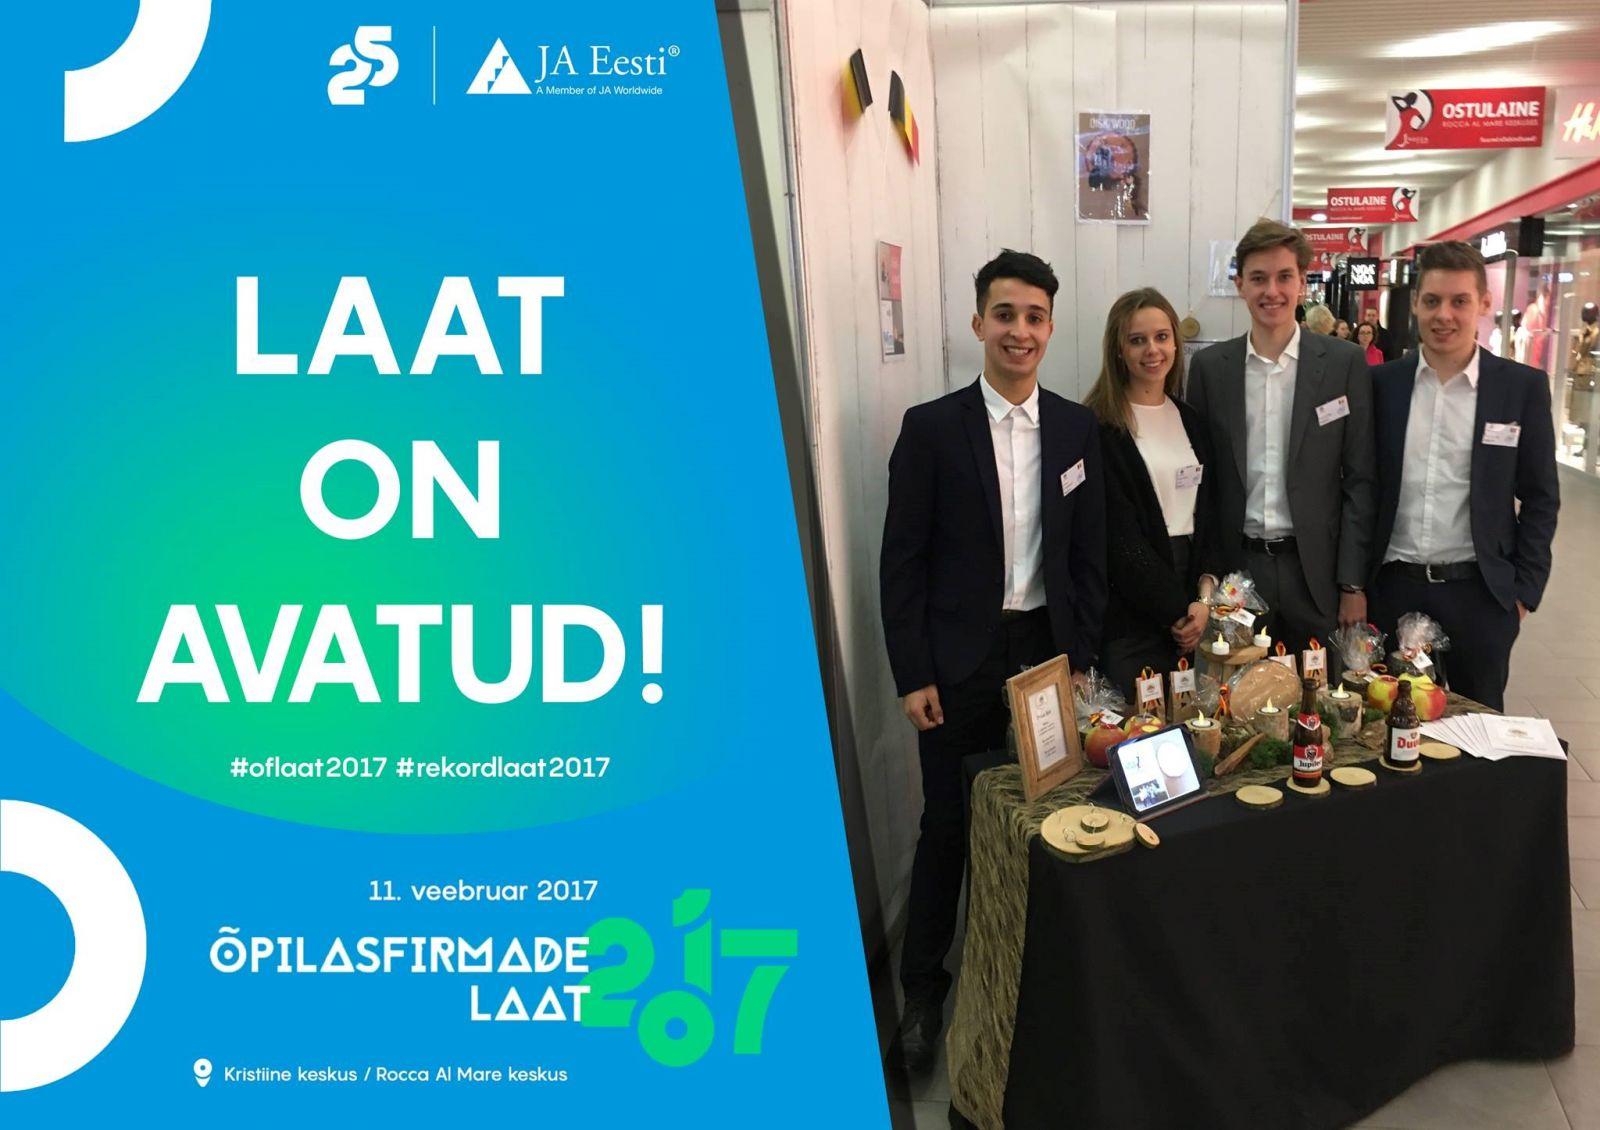 Turnhoutse miniondernemers maken indruk in Estland!